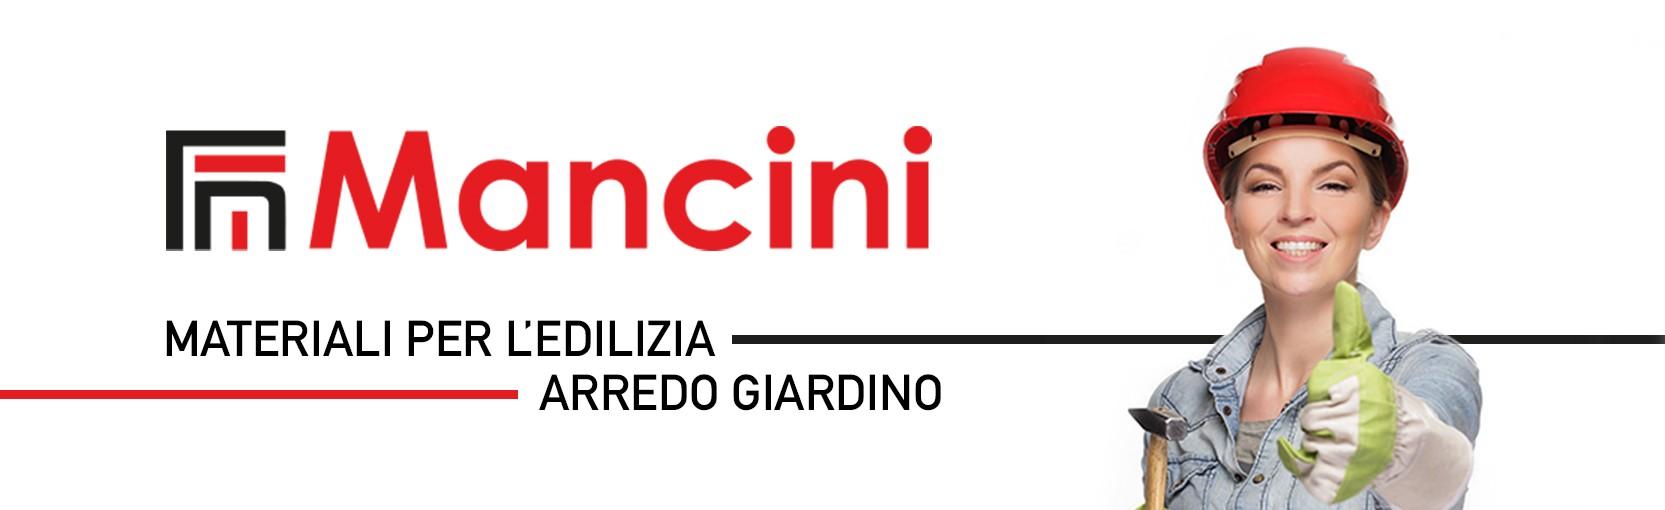 Flli Mancini